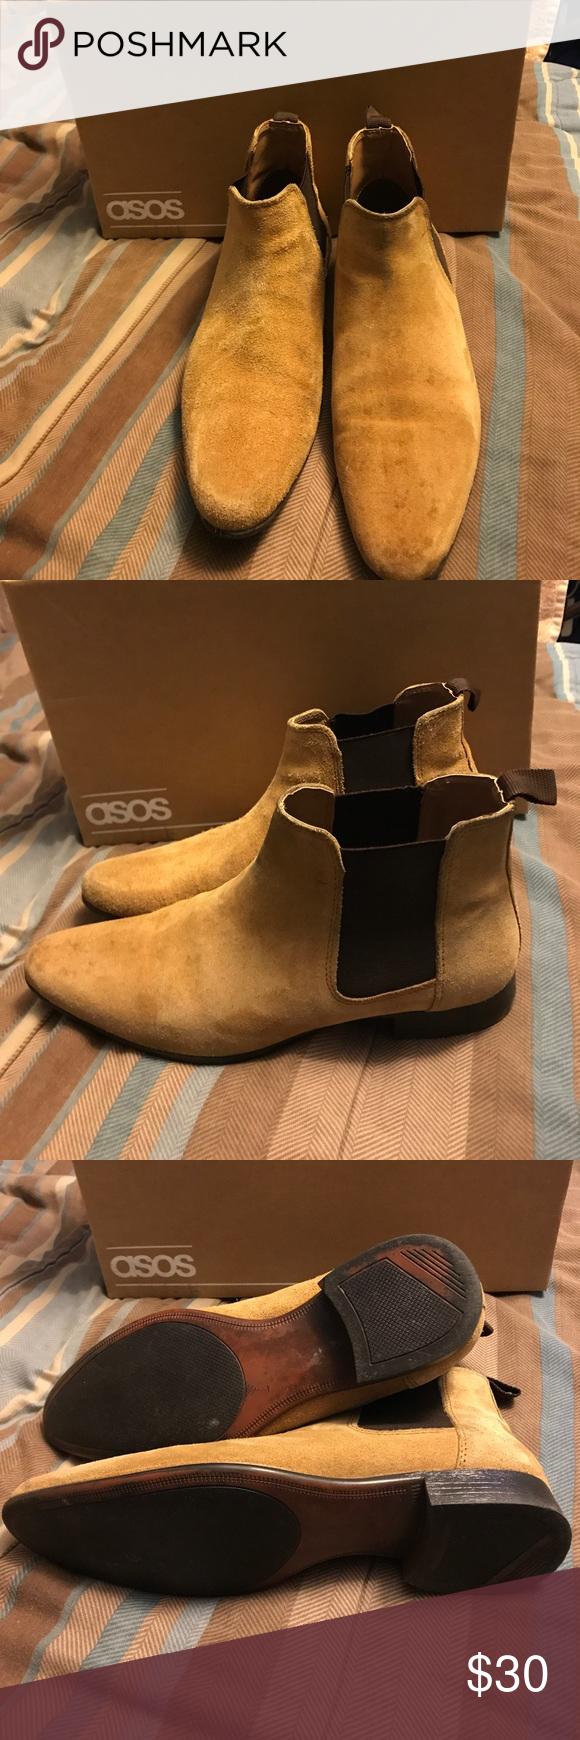 asos men s chelsea boots pinterest asos shoes and chelsea